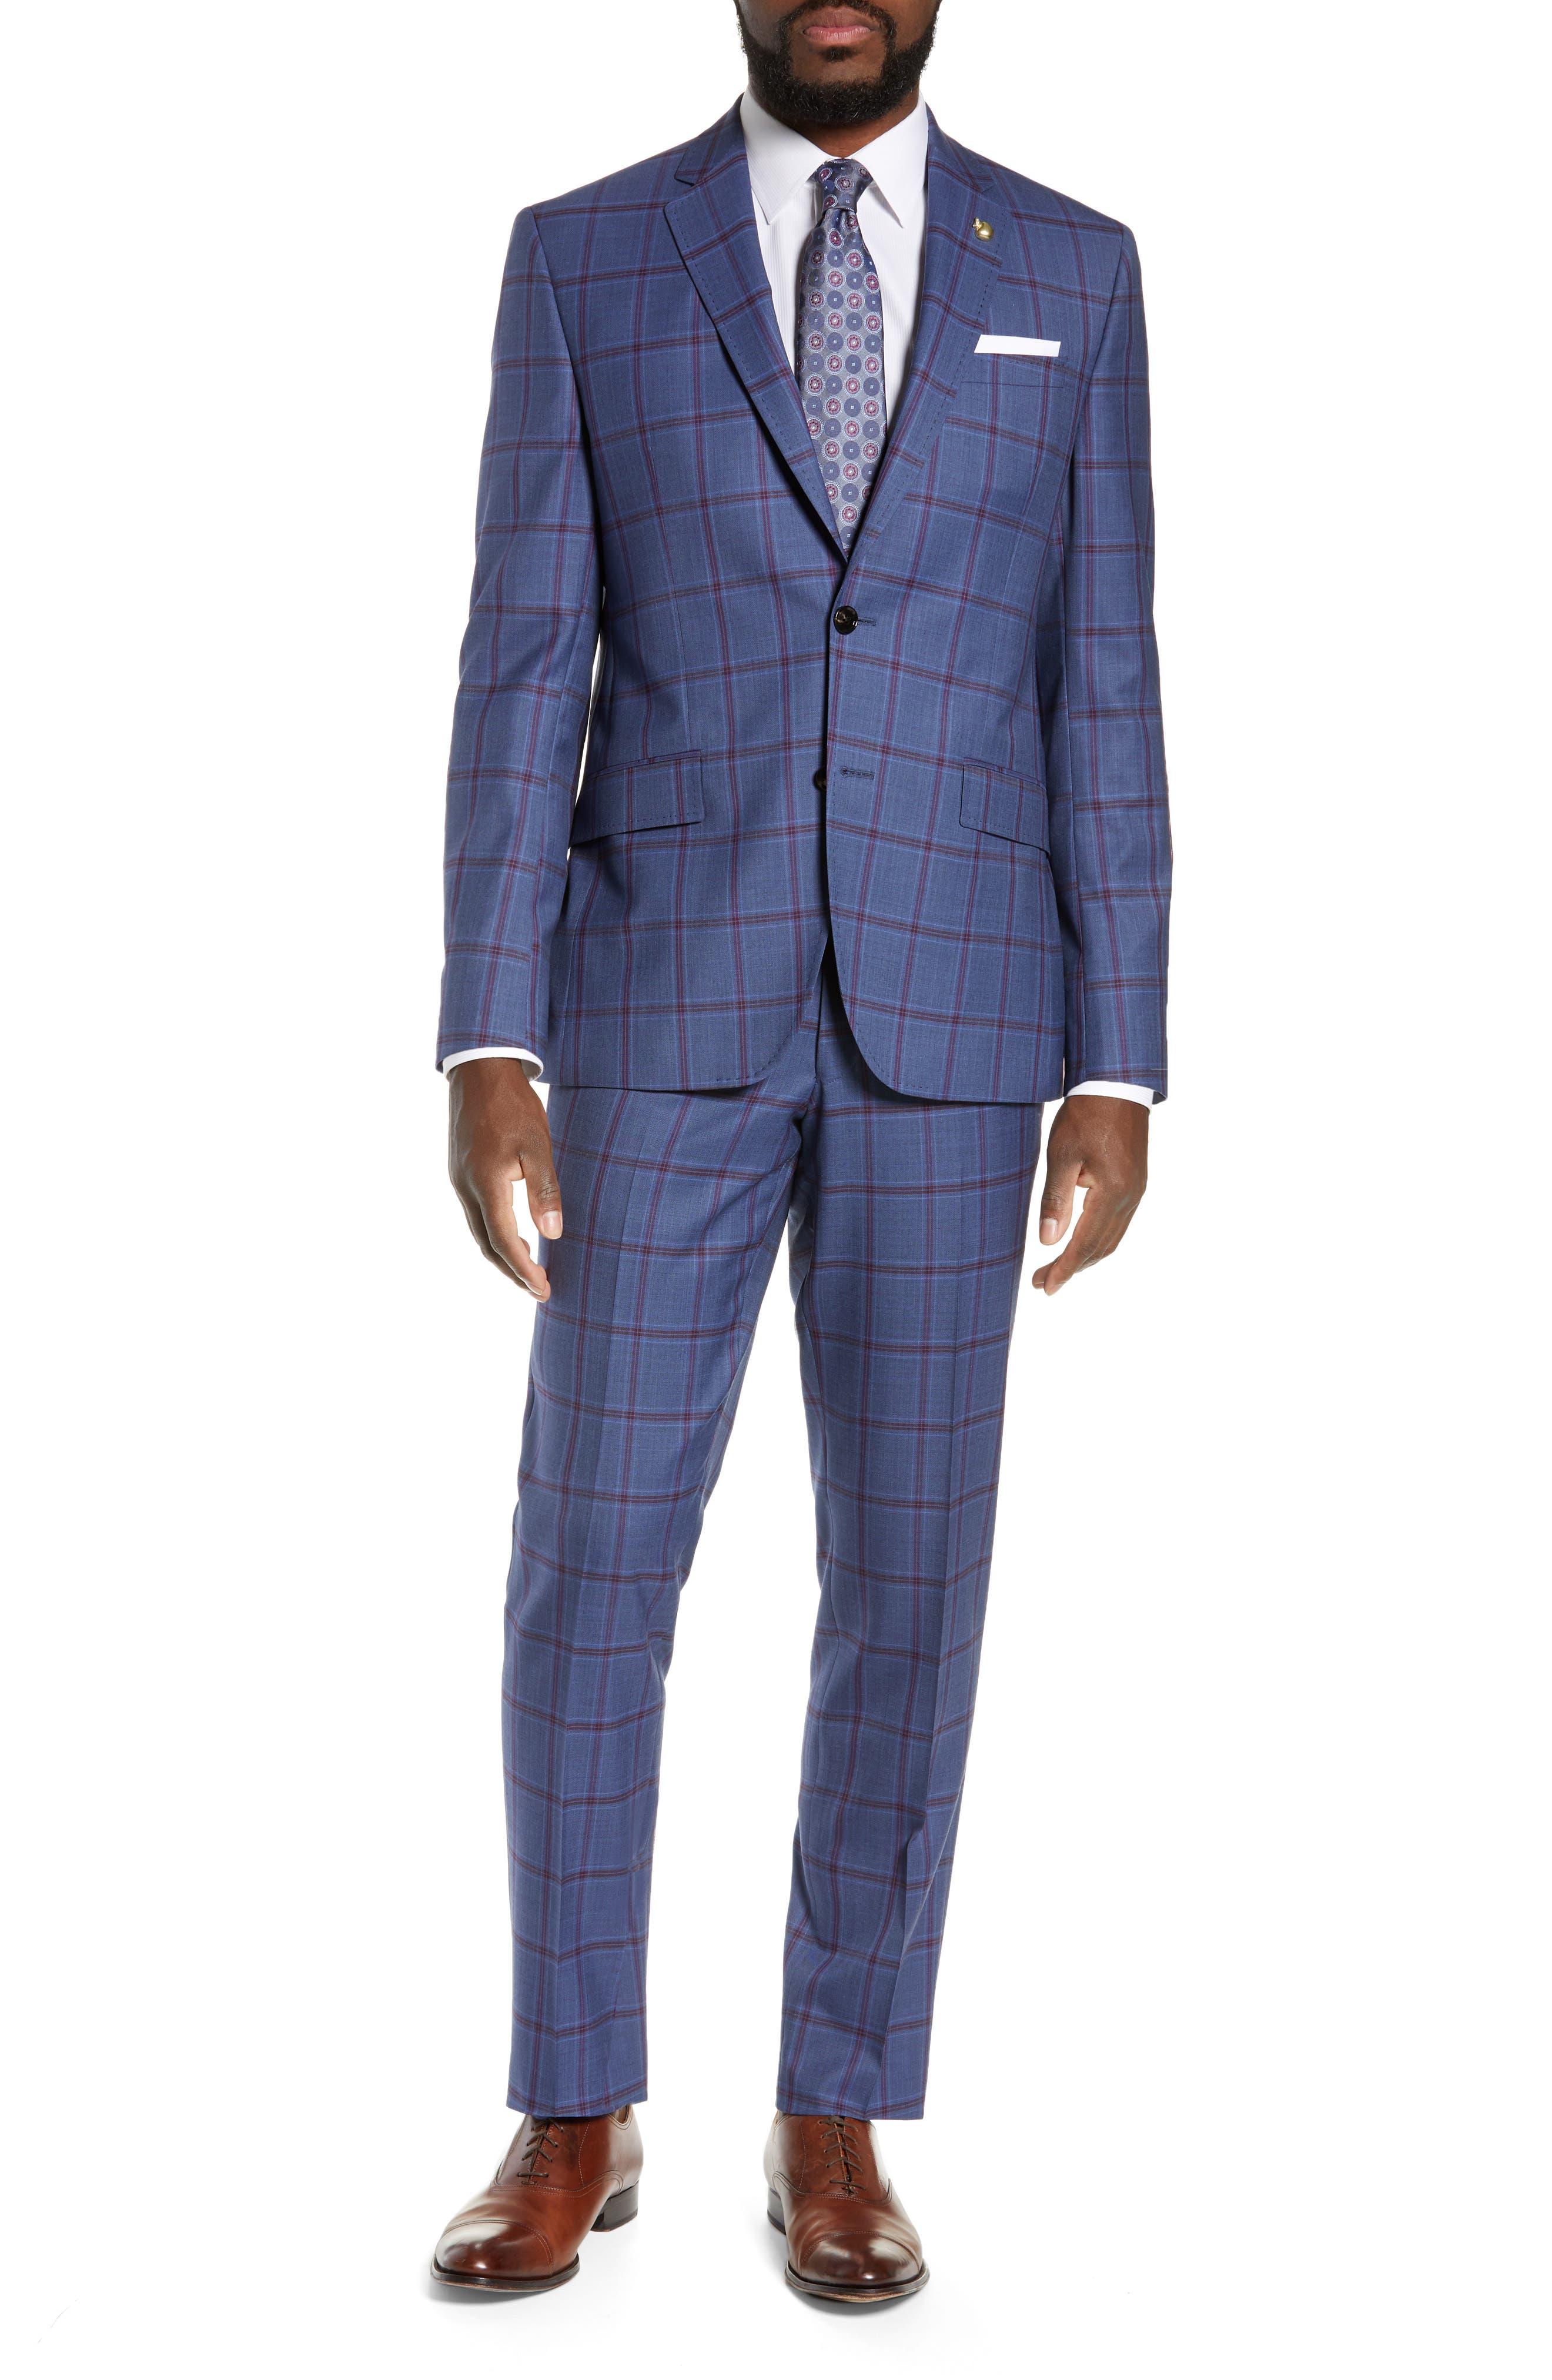 TED BAKER LONDON, Jay Trim Fit Windowpane Suit, Main thumbnail 1, color, BLUE